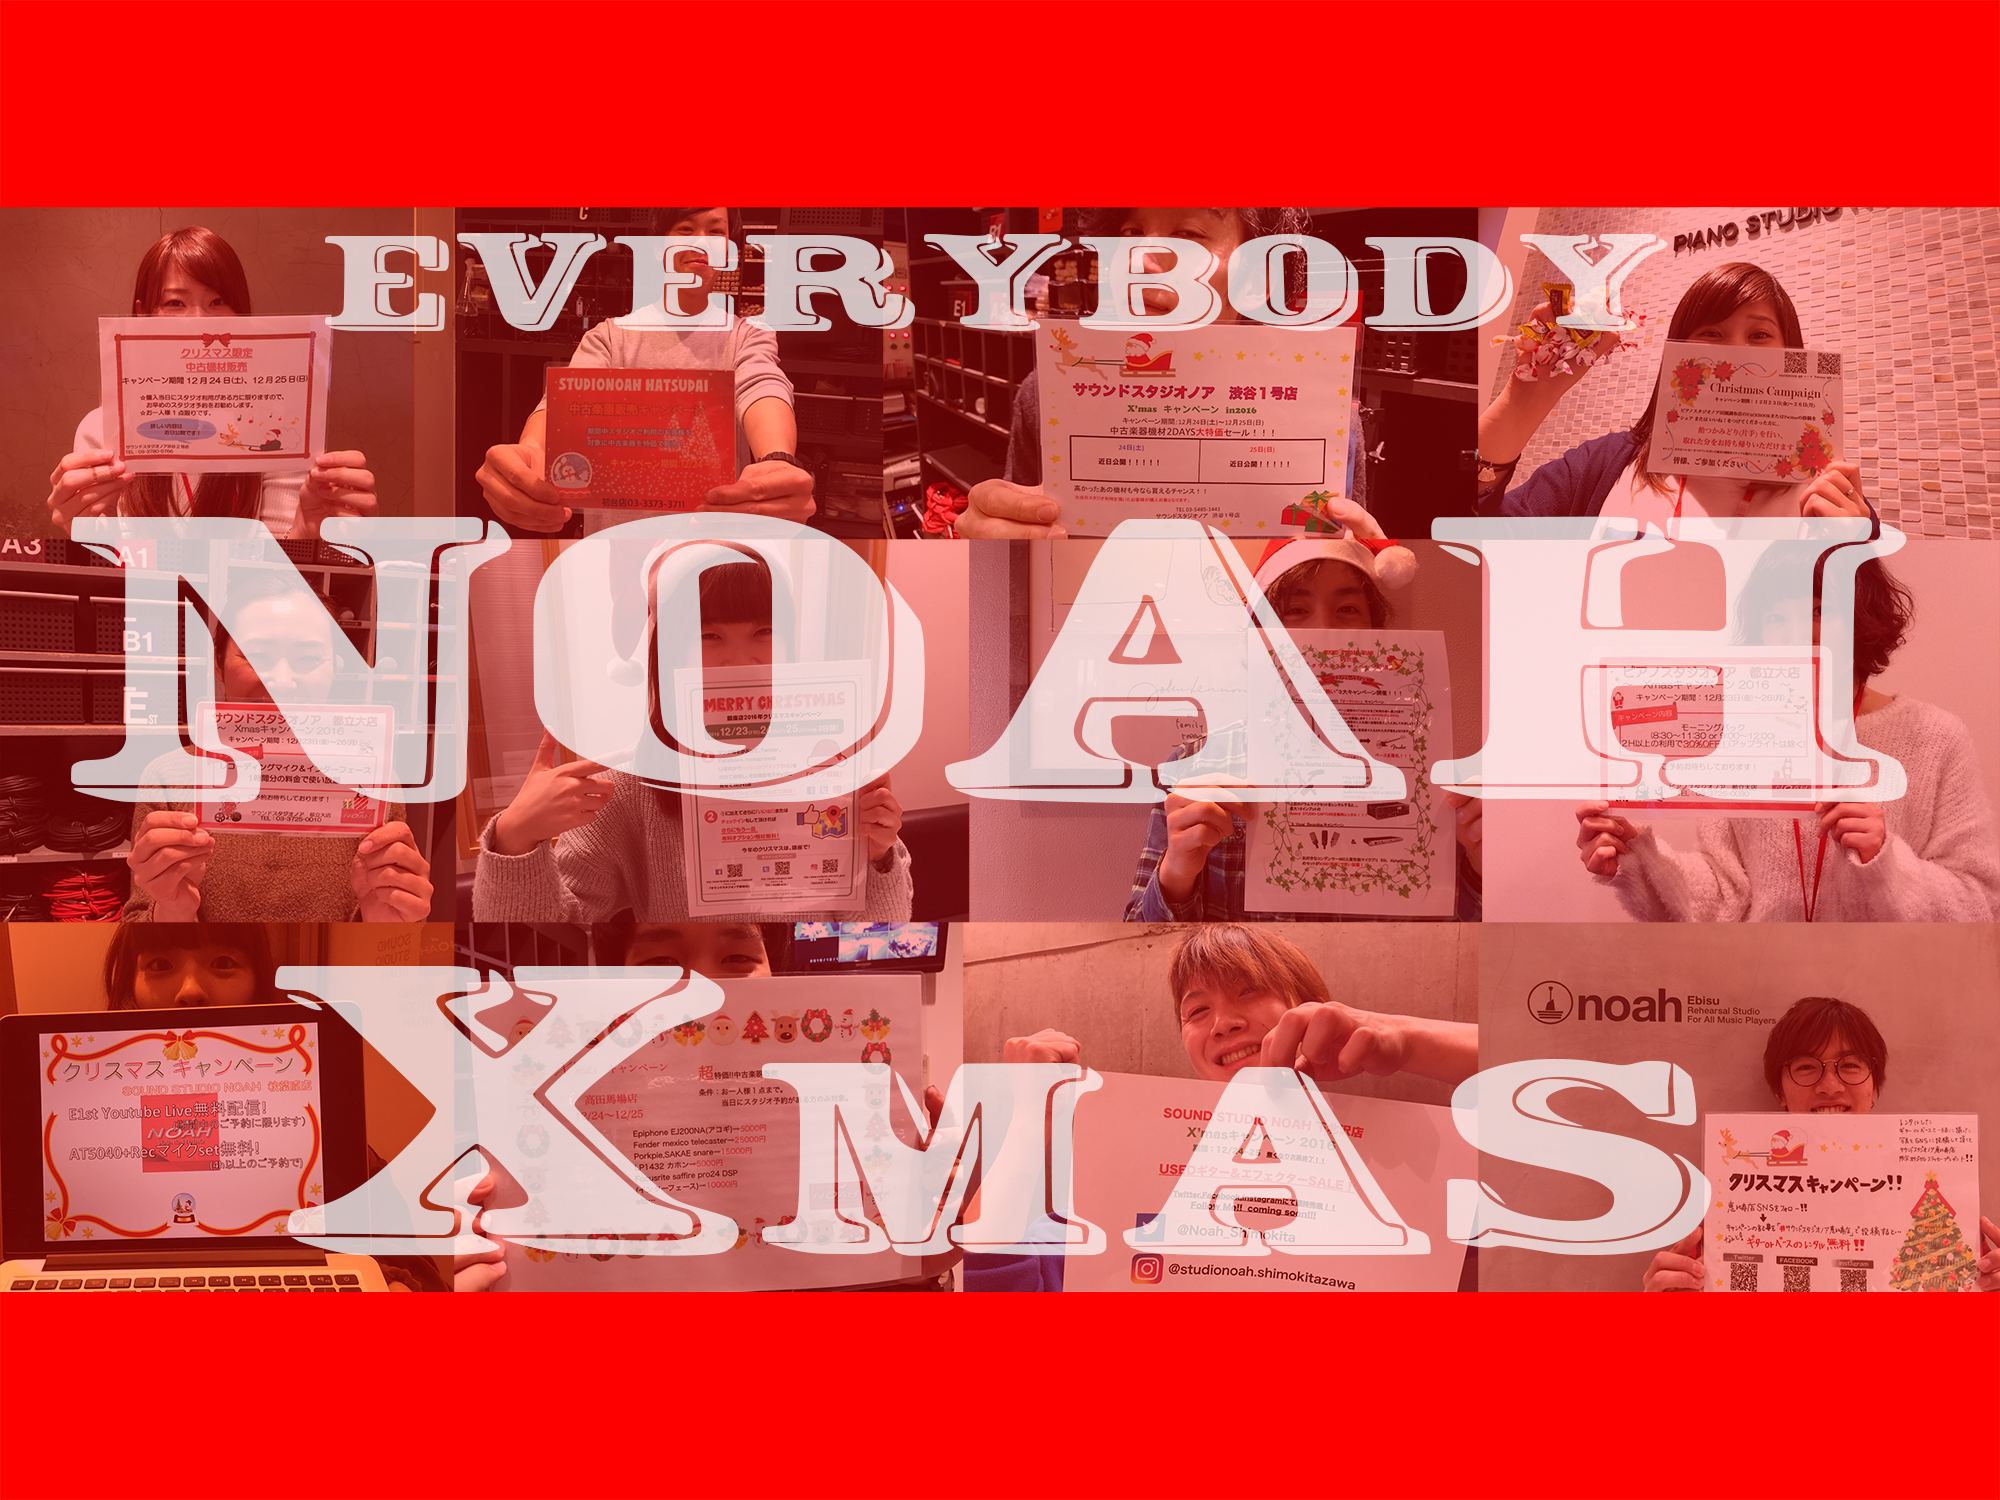 【NOAH全店情報】クリスマスはNOAHで過ごそう!〜お得すぎるキャンペーンの全貌〜